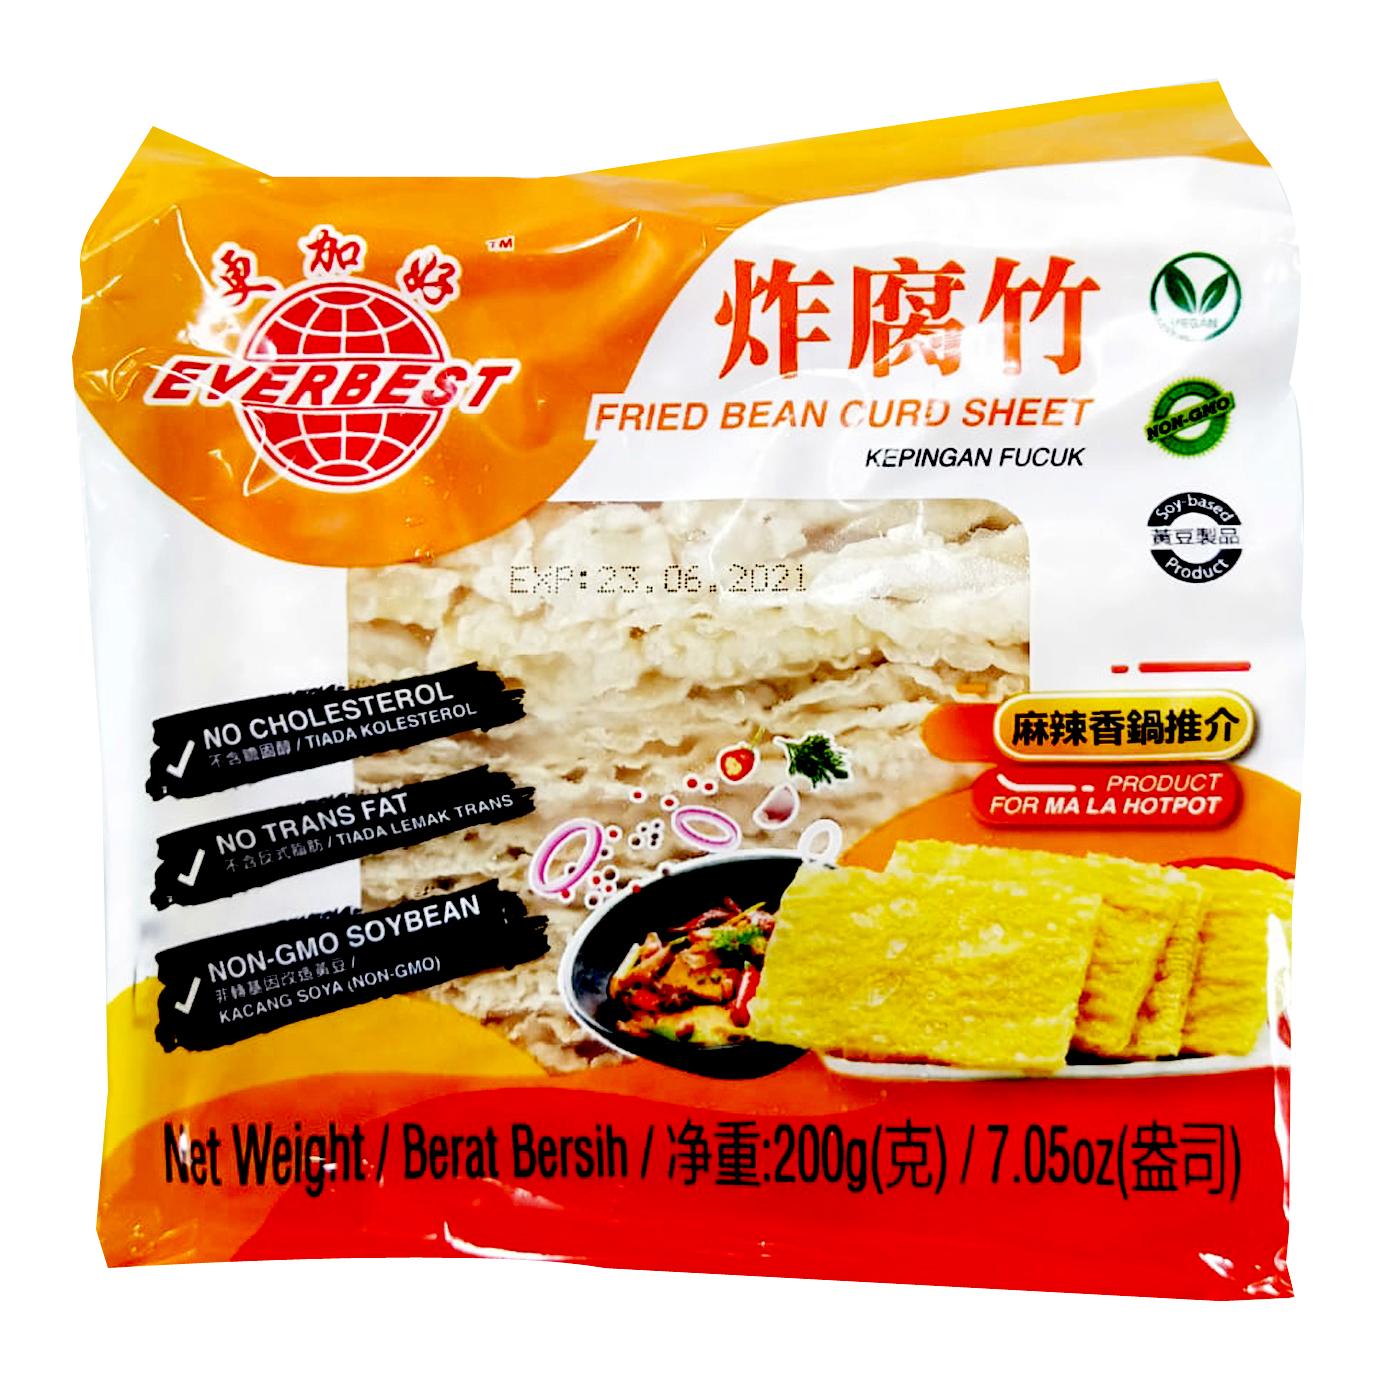 Image Fried Bean Curd Sheet 更加好 - 炸腐竹片 (纯) 200grams